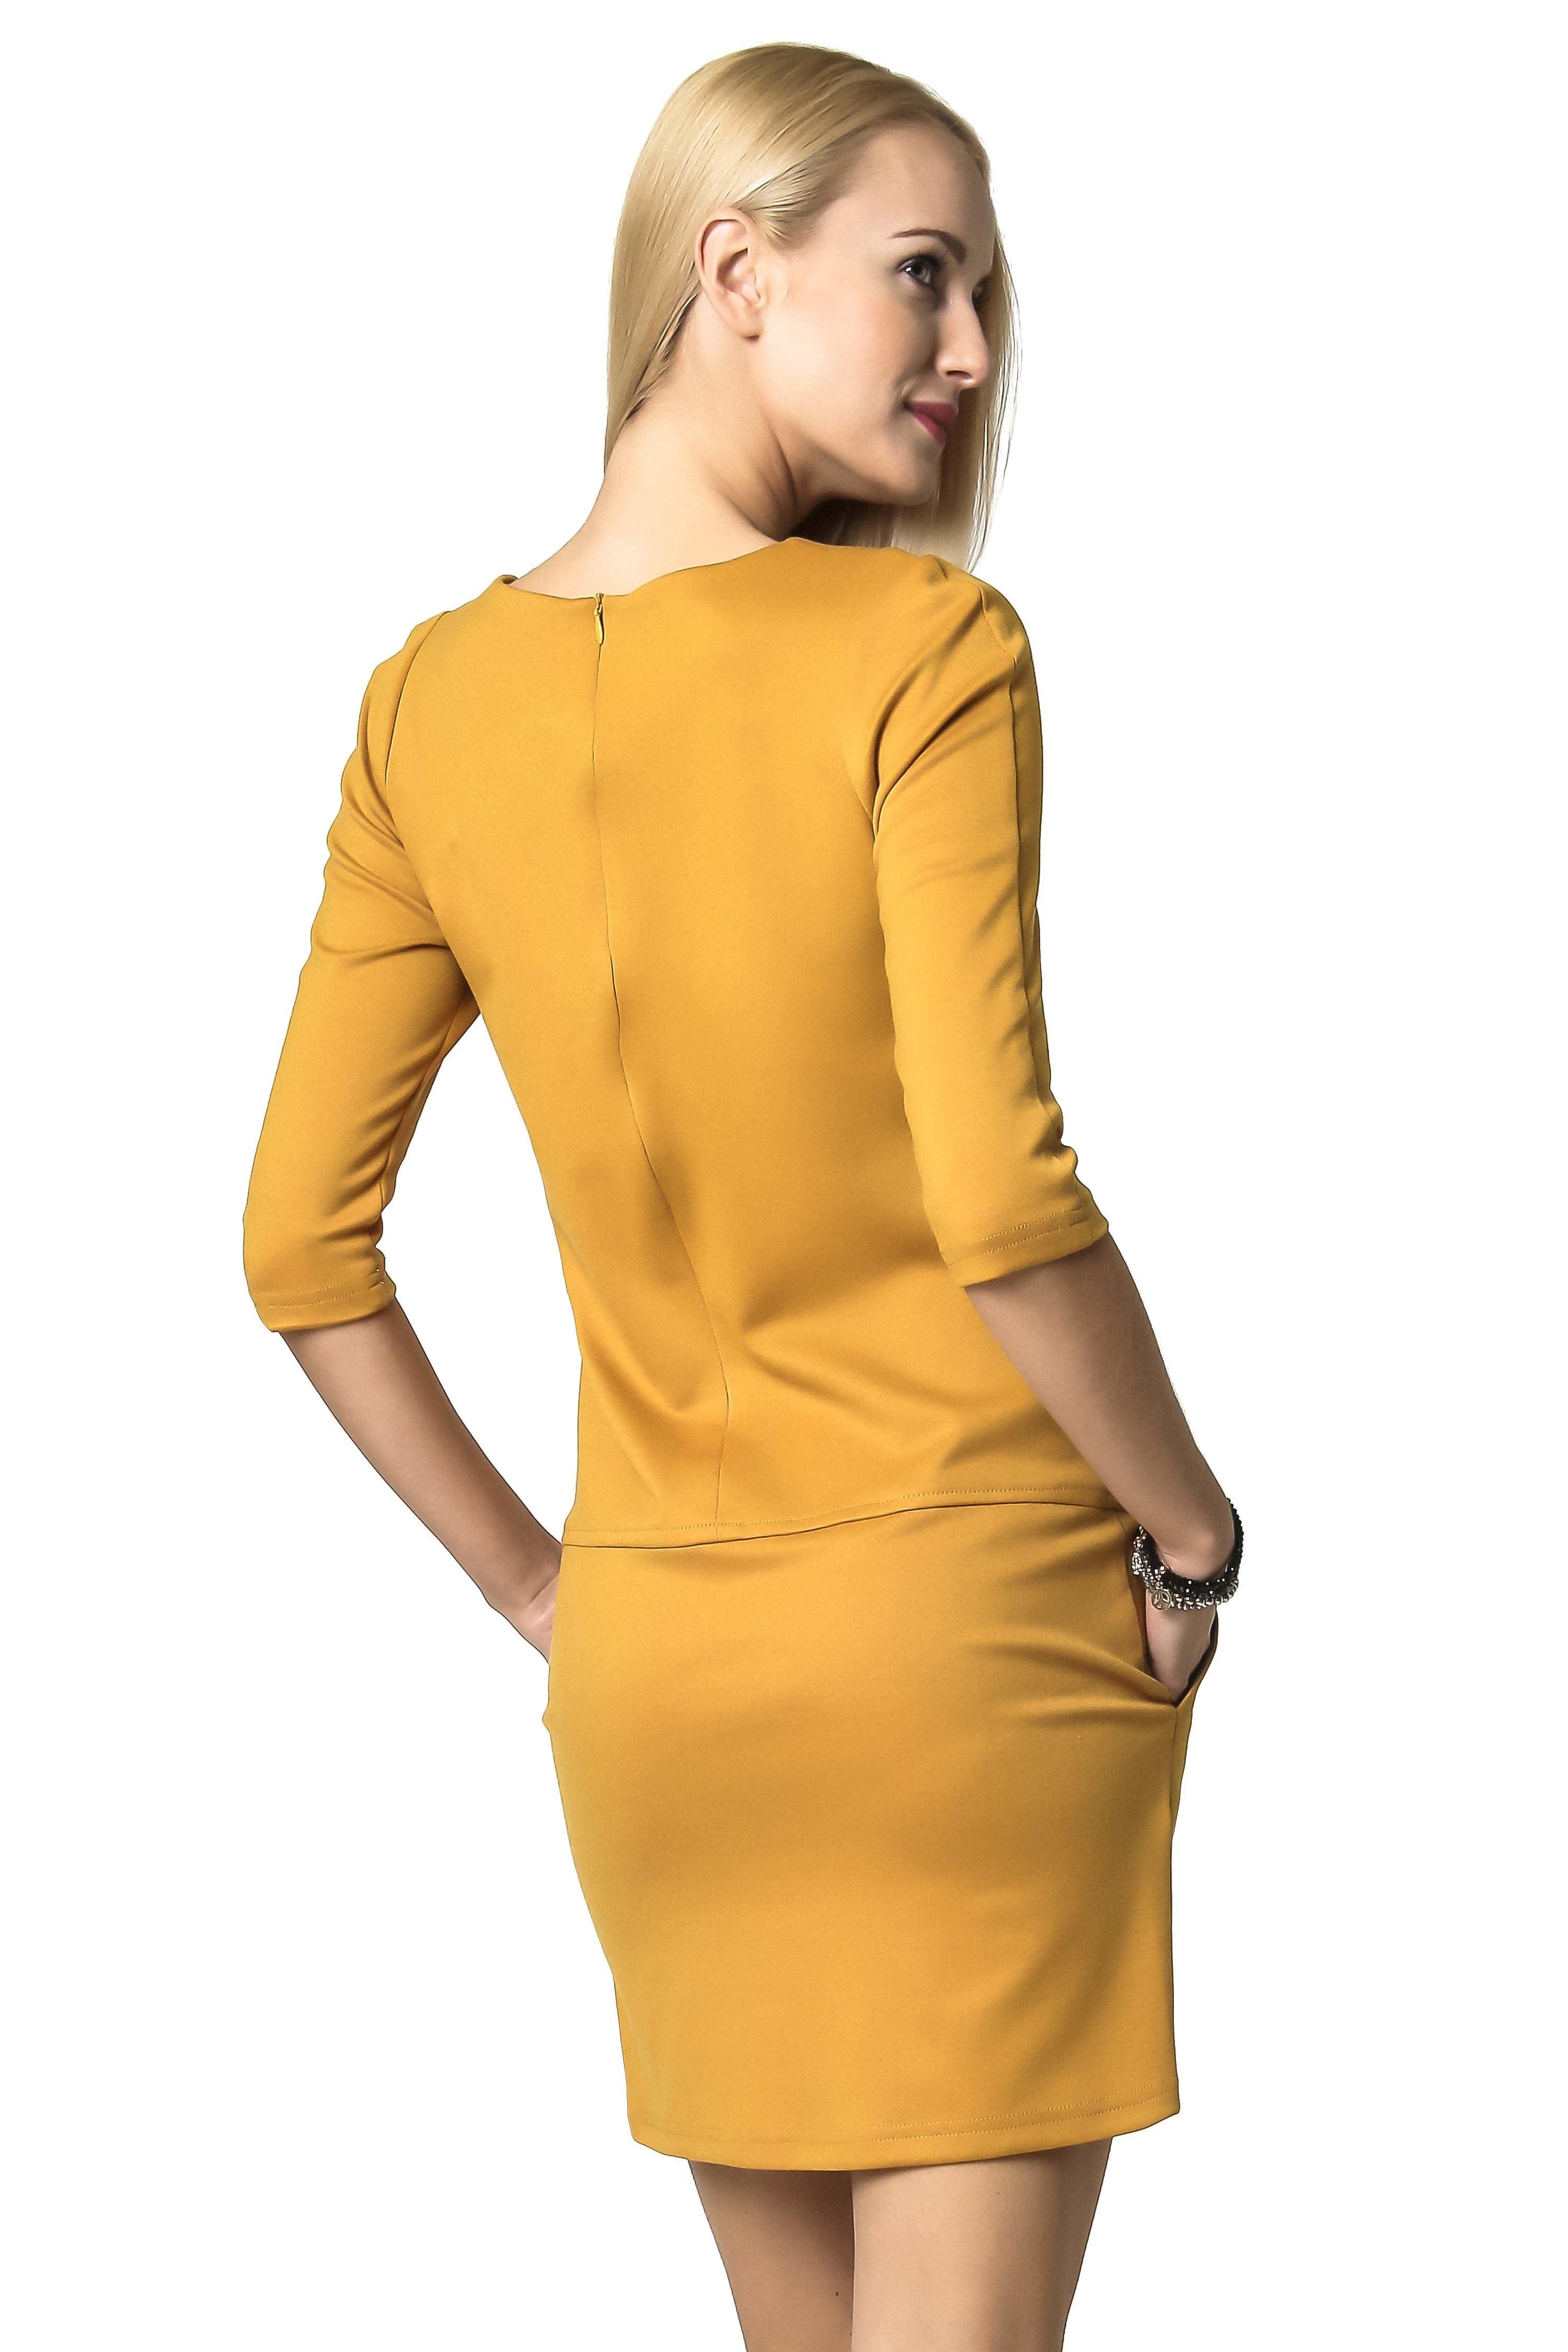 ELENA dress in honey color